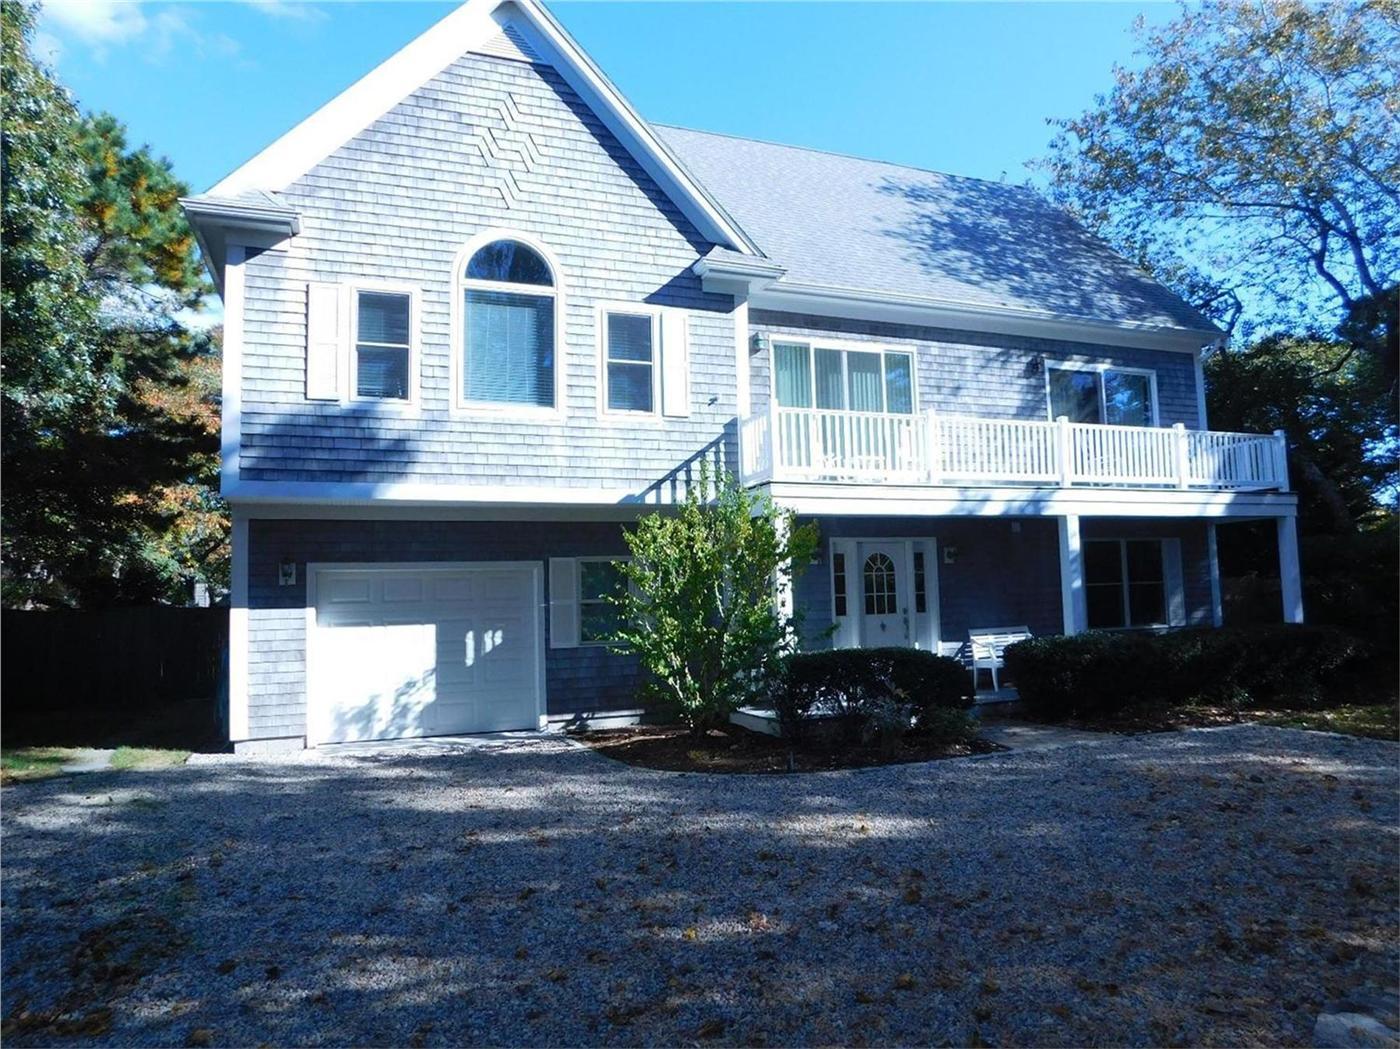 Hyannis vacation rental home in cape cod ma 02601 kalmus for Cabin rentals in cape cod ma